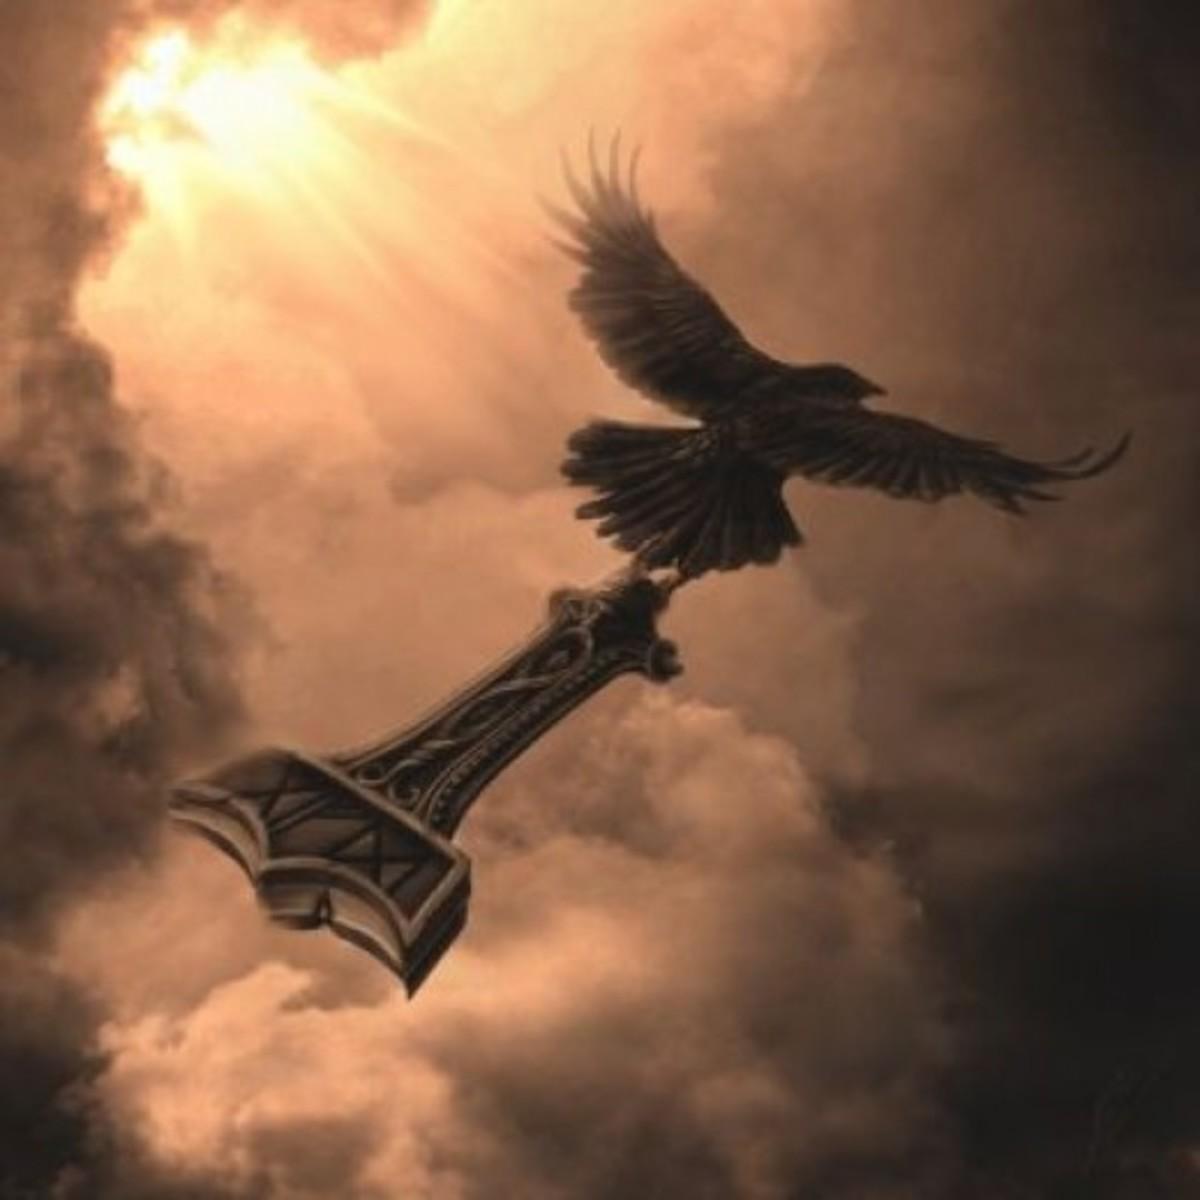 The sky belongs to Asagods... As long as the raven flies